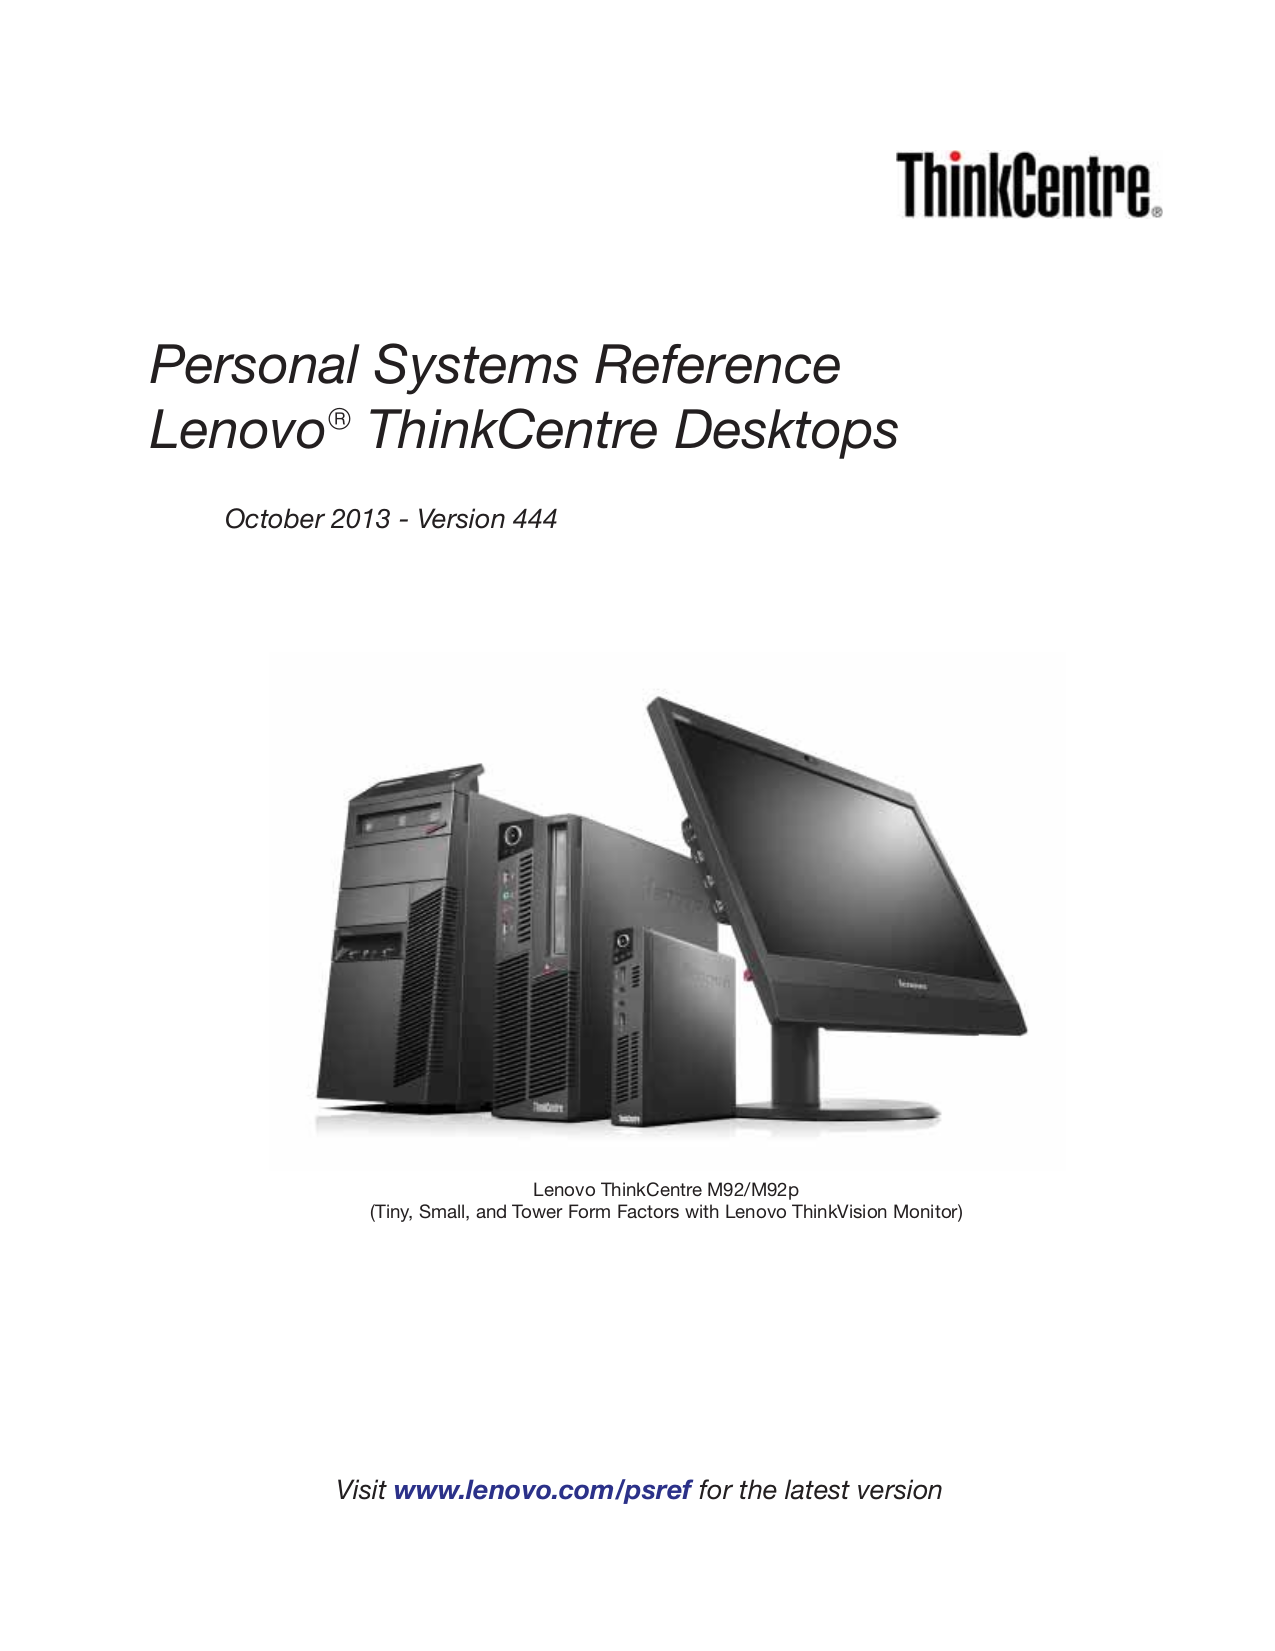 pdf for Lenovo Desktop ThinkCentre M90p 5852 manual